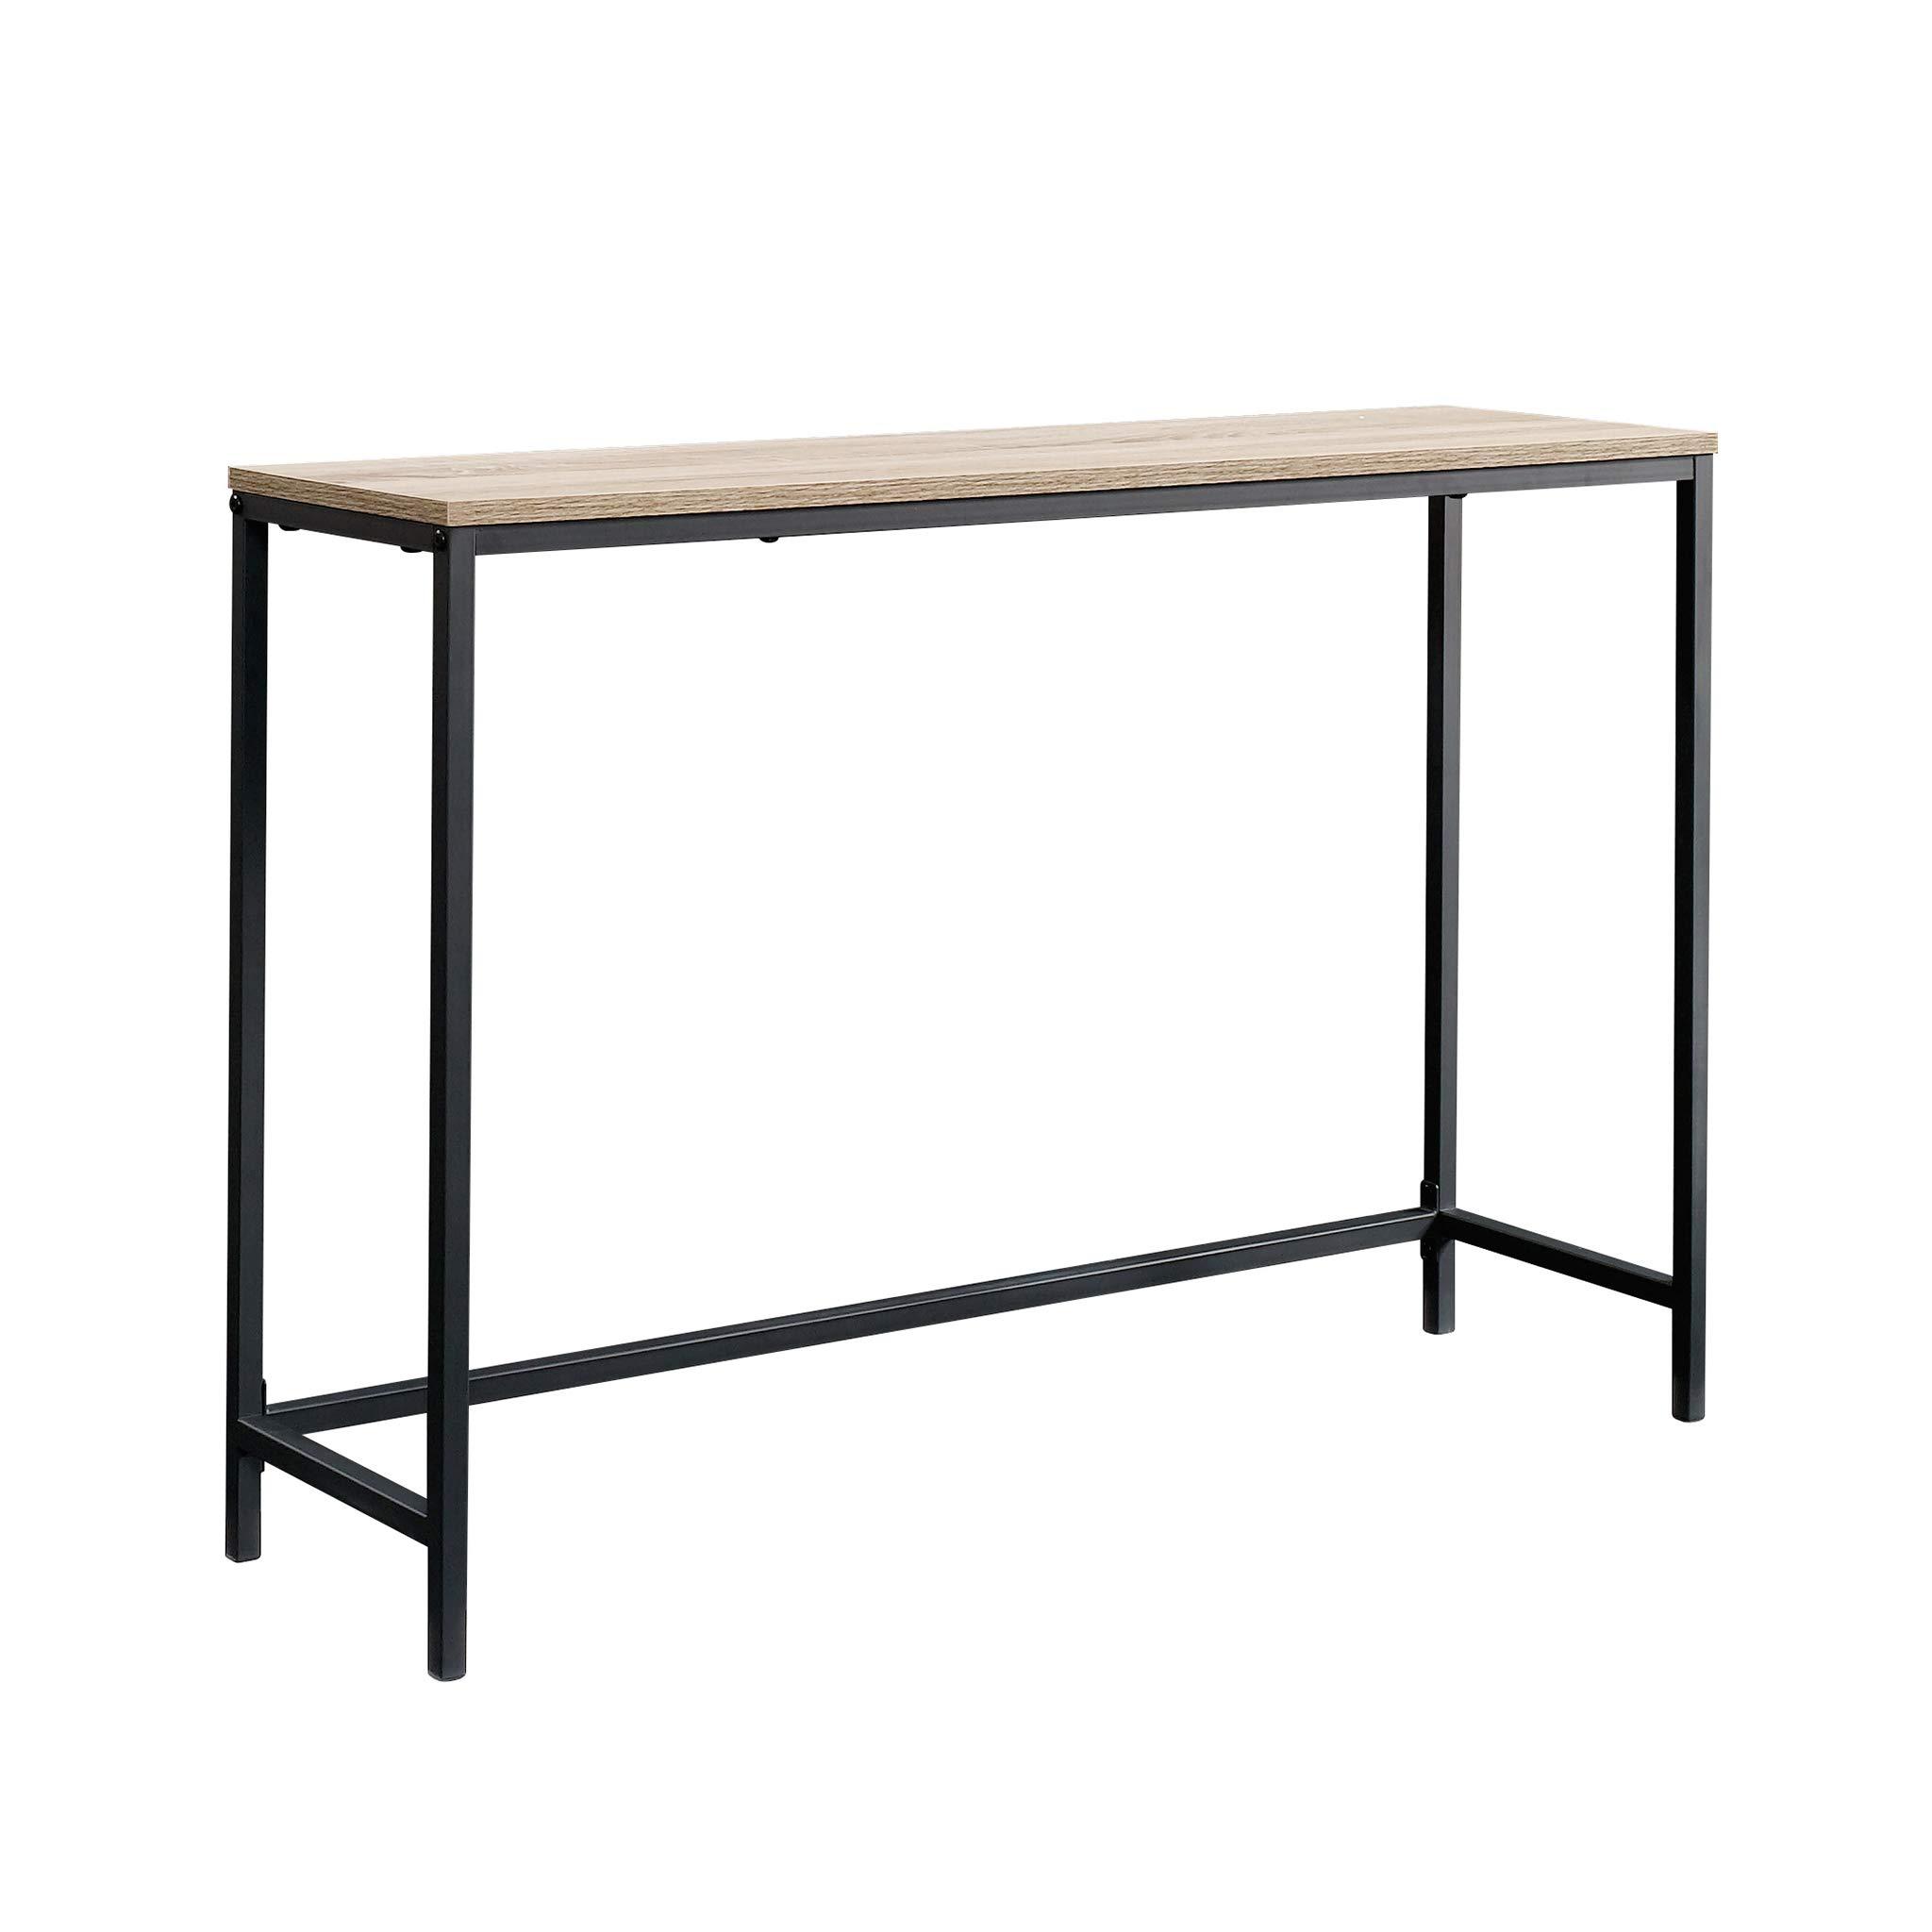 Sauder 420042 North Avenue Sofa Table, L: 41.50'' x W: 11.50'' x H: 28.03'',  Charter Oak finish by Sauder